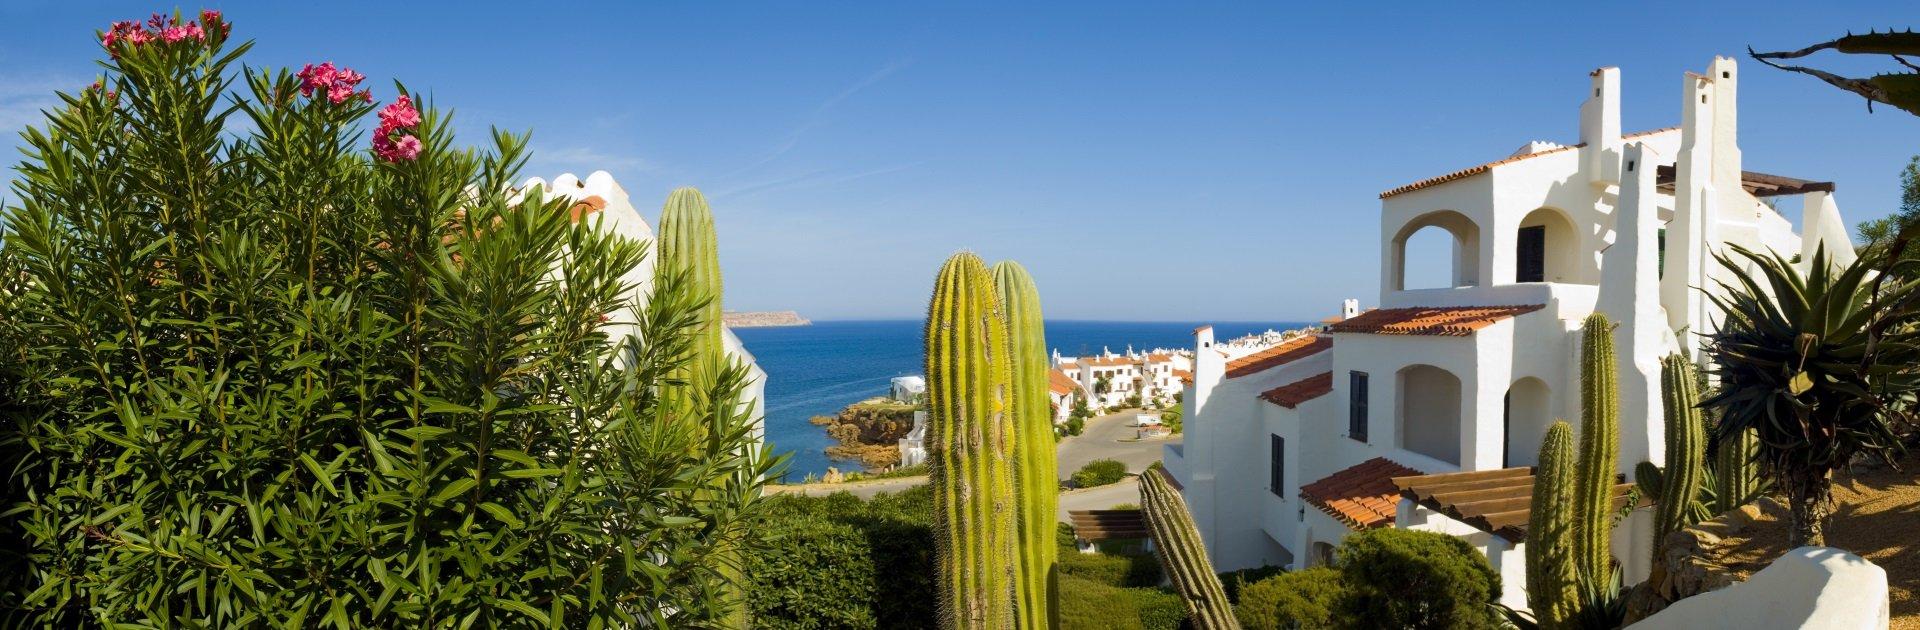 Ferienunterkünfte in Spanien